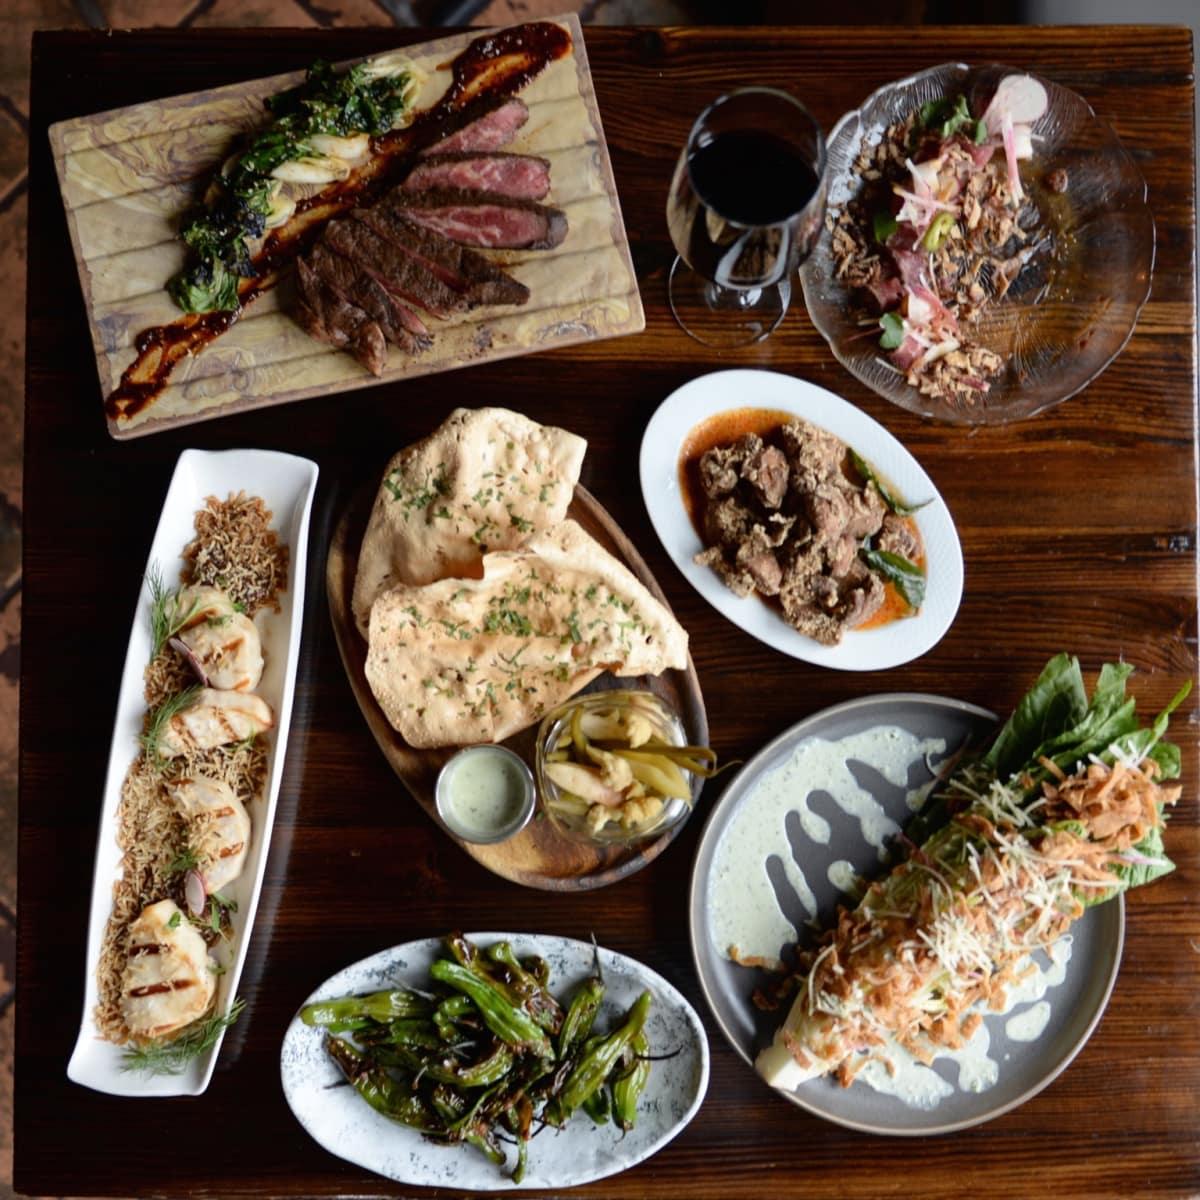 Ambrosia Happy Hour plates